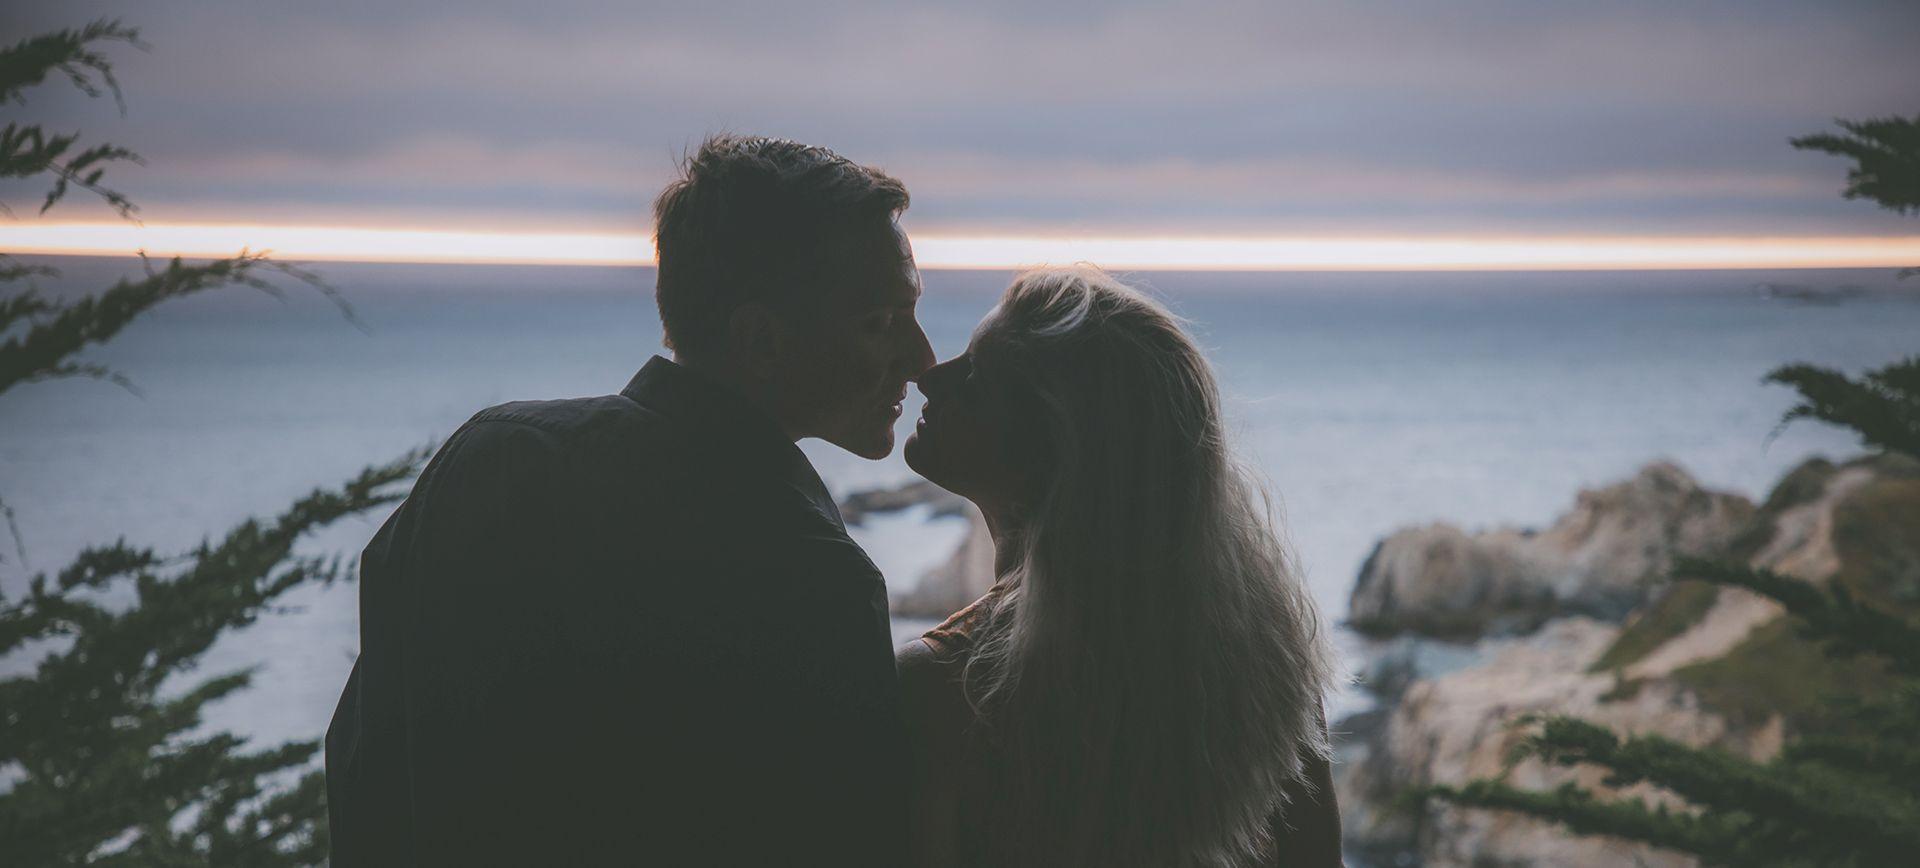 adventure couple photoshoot in Big Sur, California